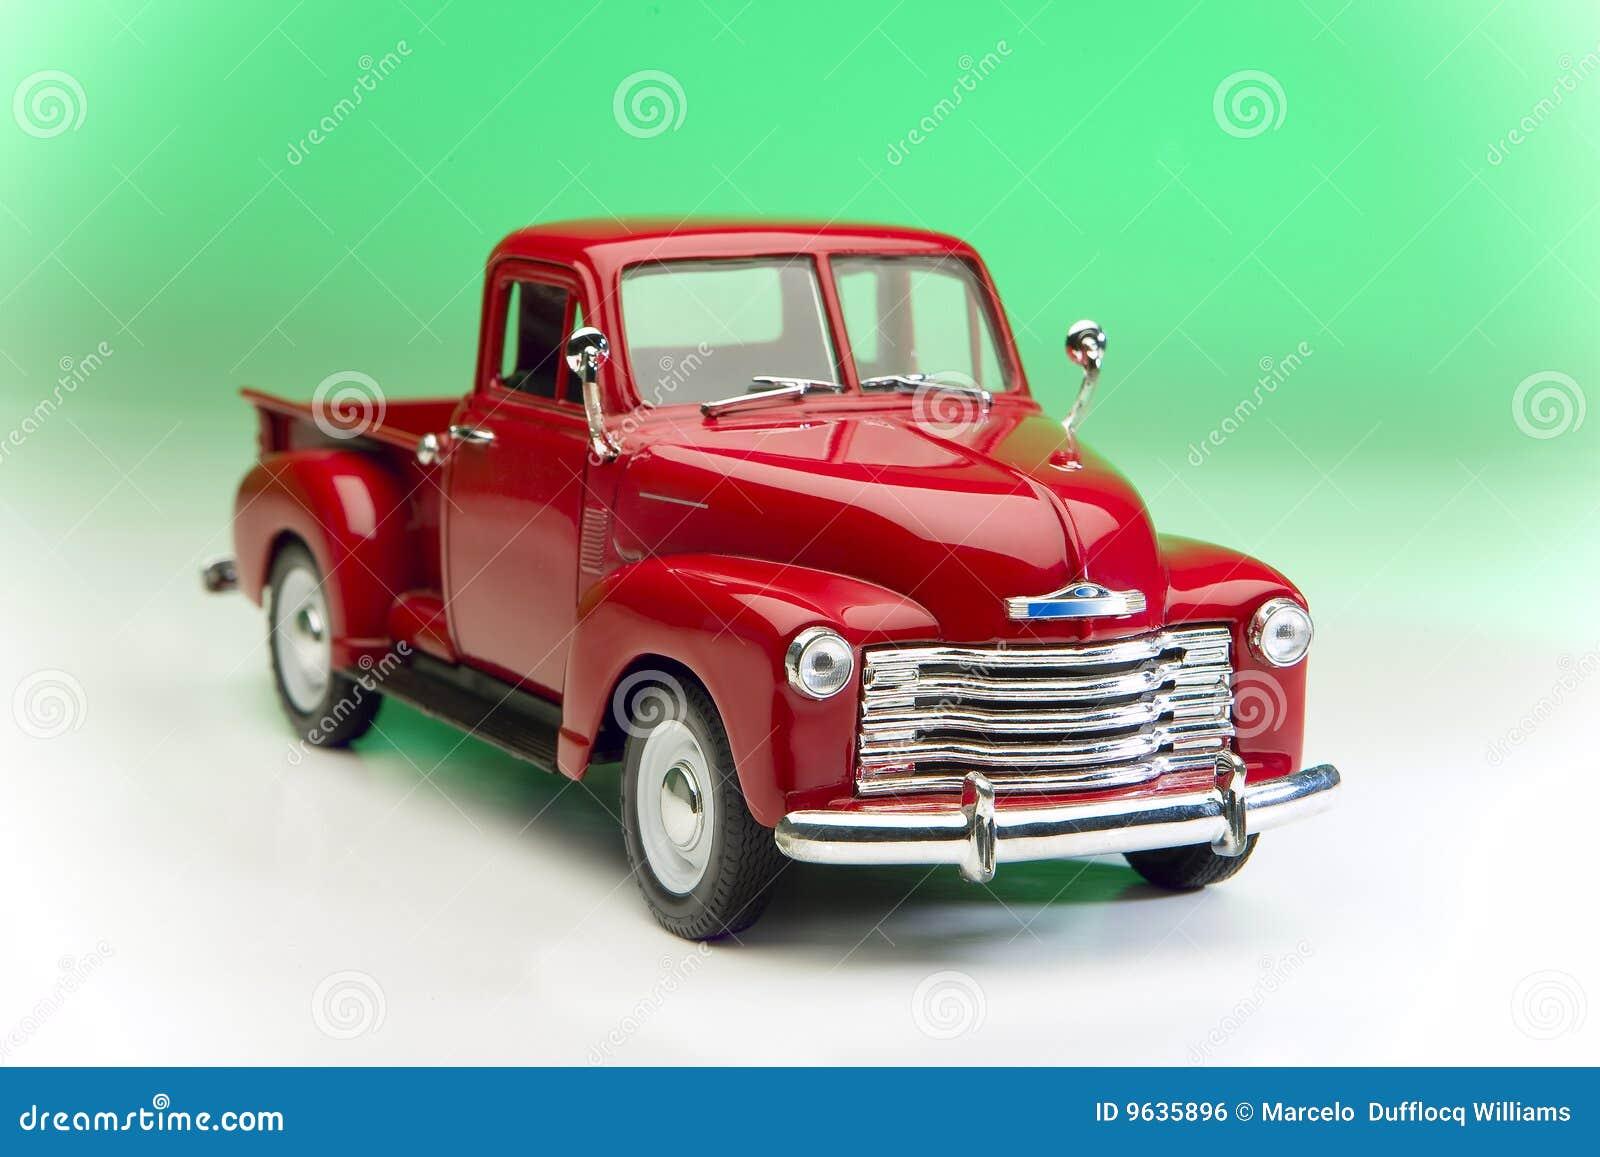 Vintage pickup truck stock photo. Image of fender, chrome - 9635896